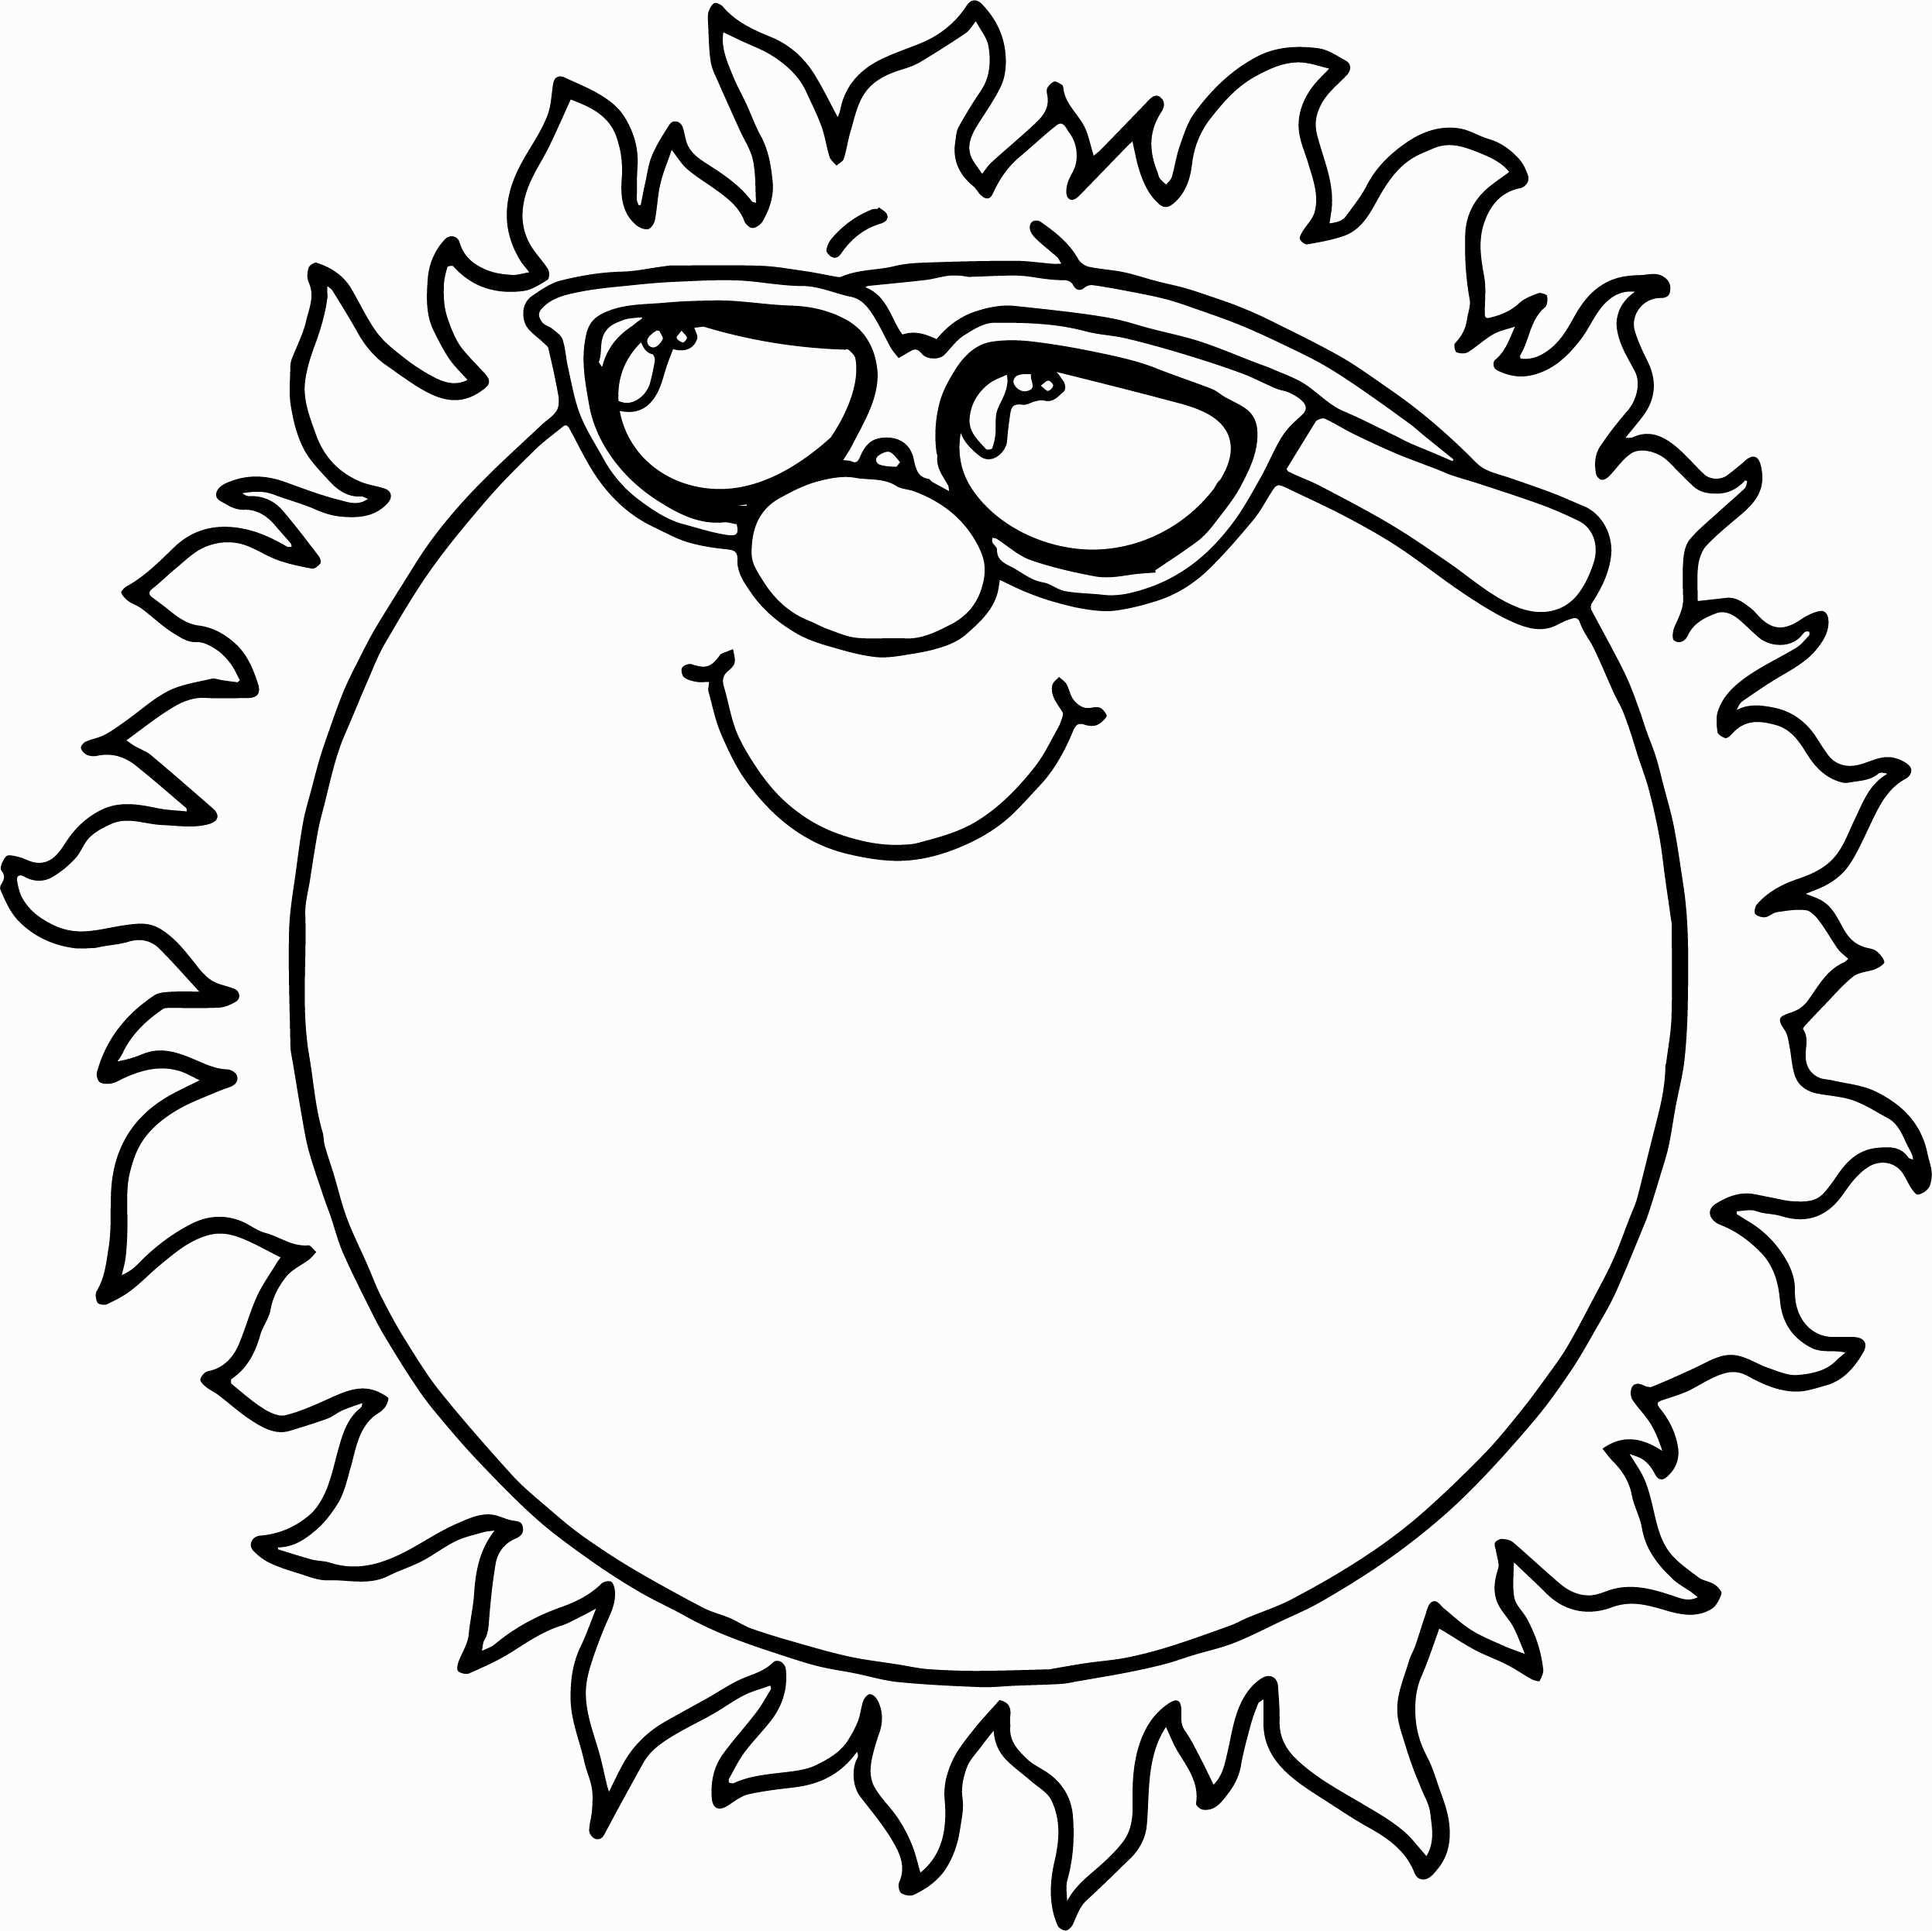 NASA insignia - Wikipedia | 2493x2494